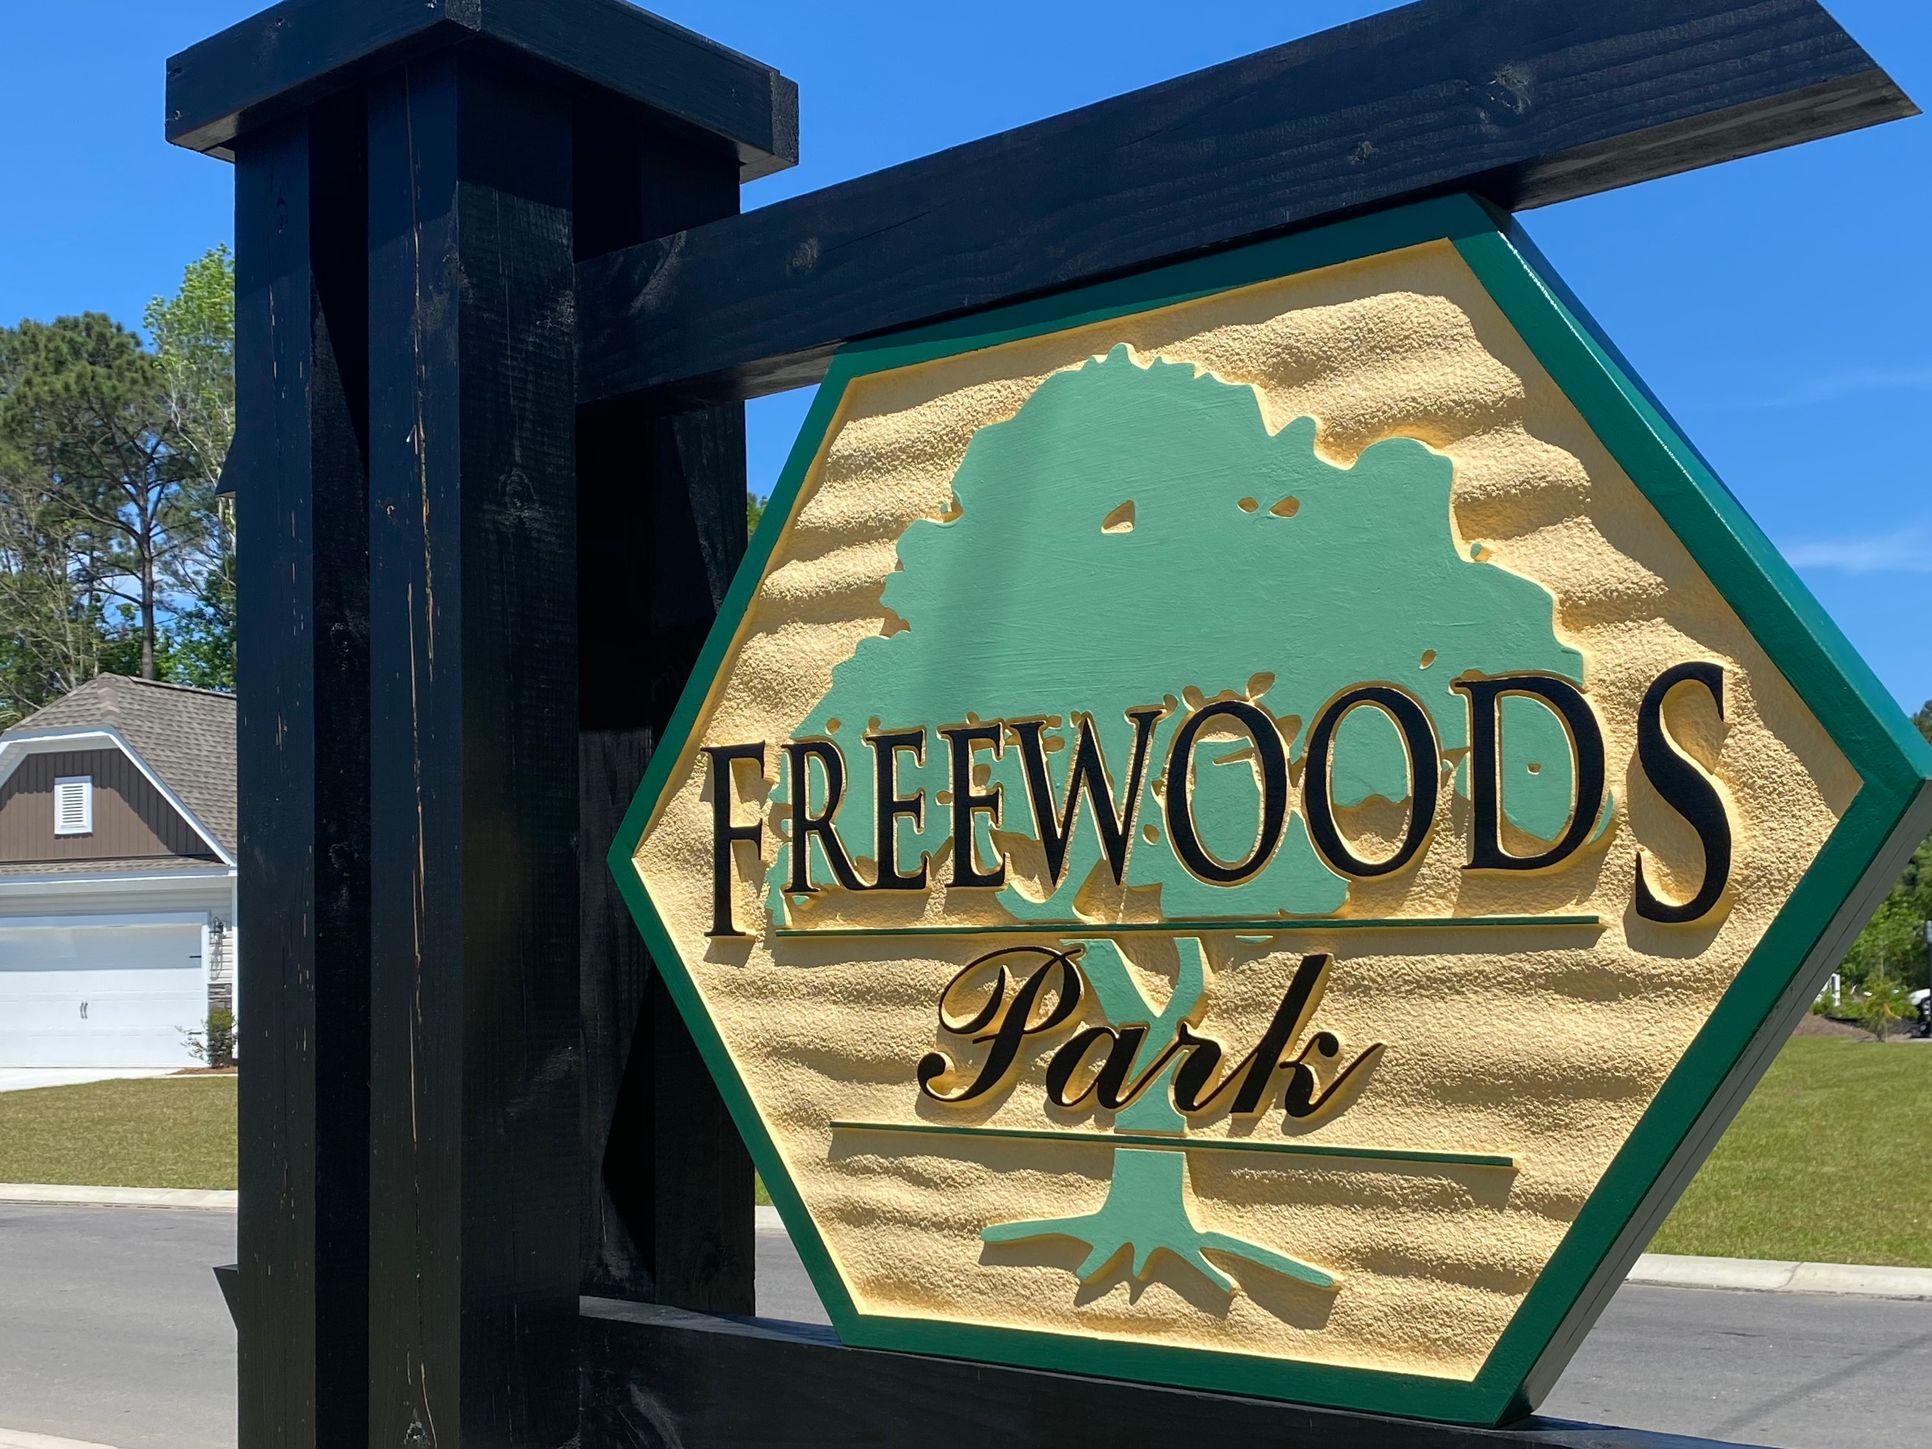 Freewoods Park Sign.jpeg